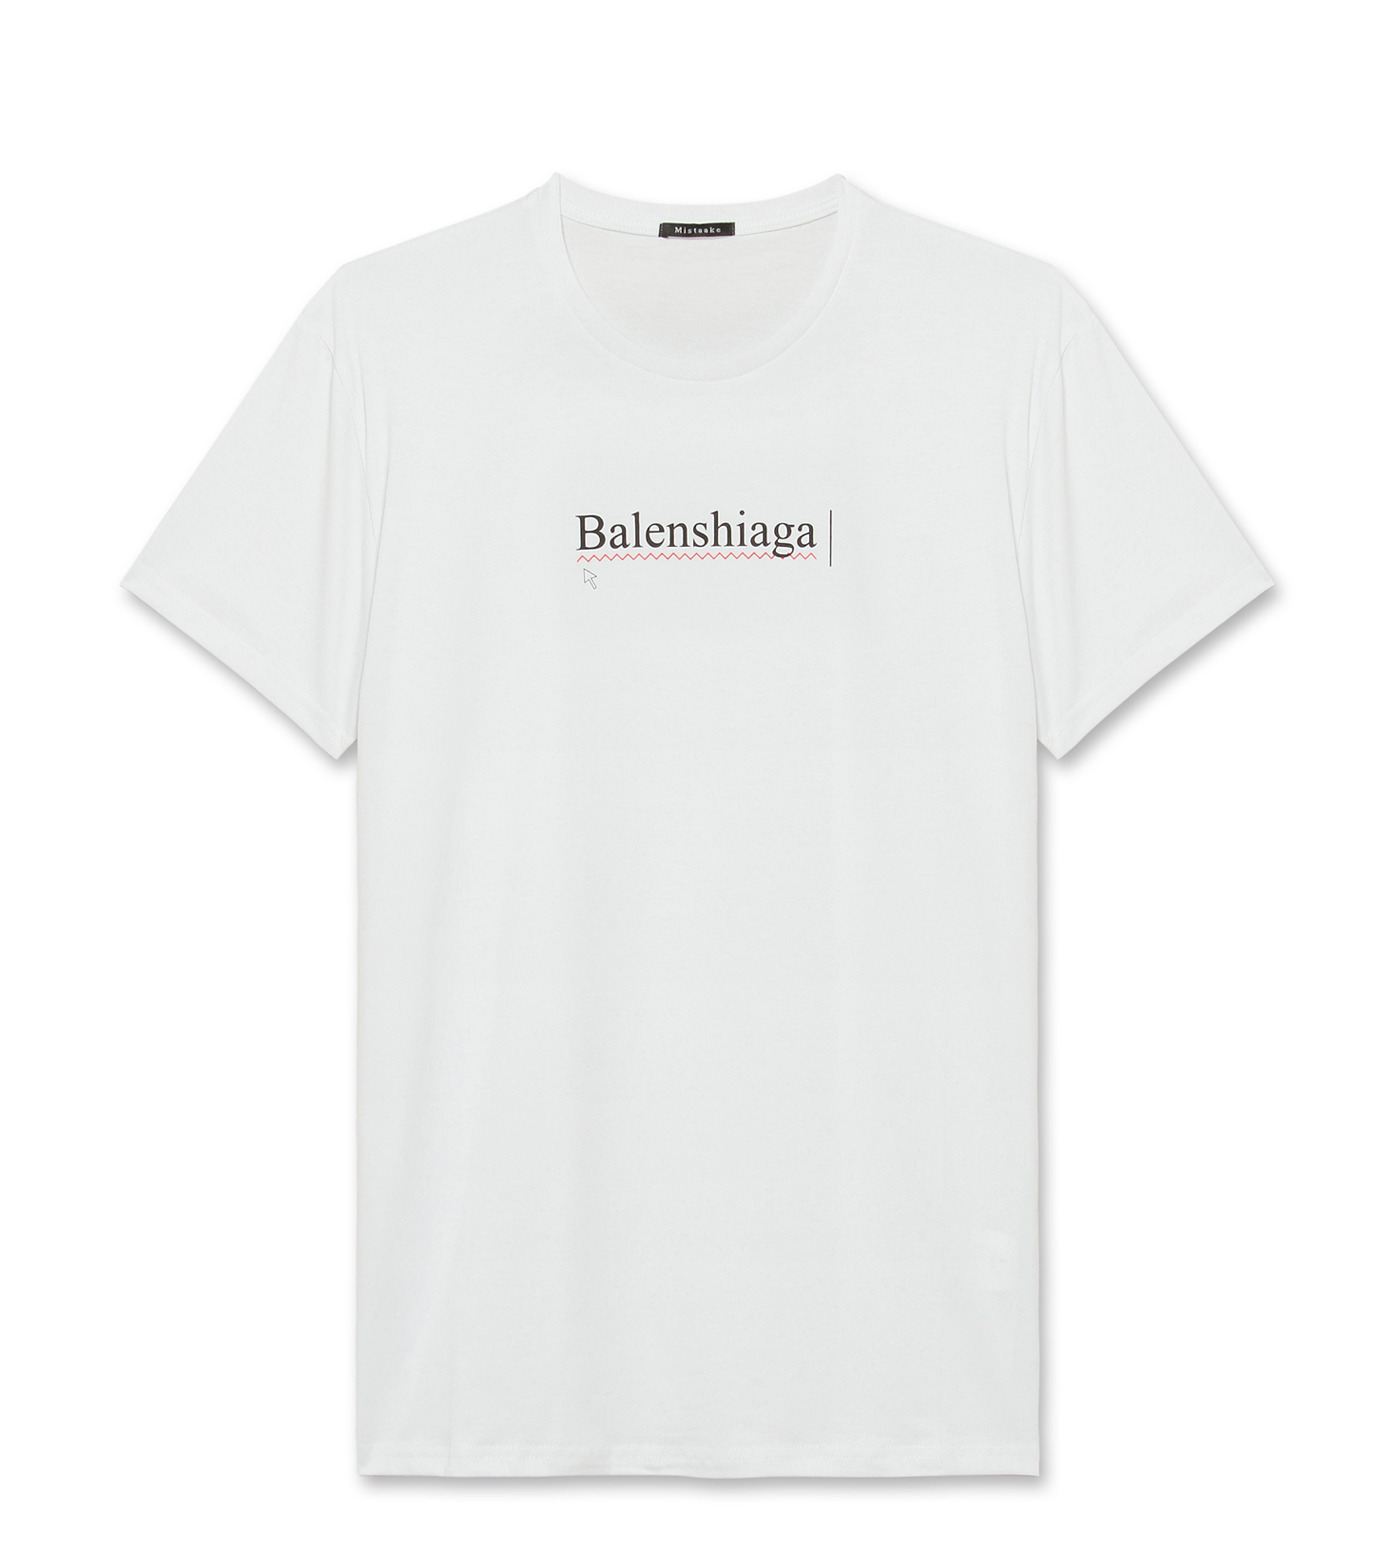 Mistaake(ミステイク)のBalemshiaga-WHITE(T-SHIRTS/T-SHIRTS)-BALWH-4 拡大詳細画像1